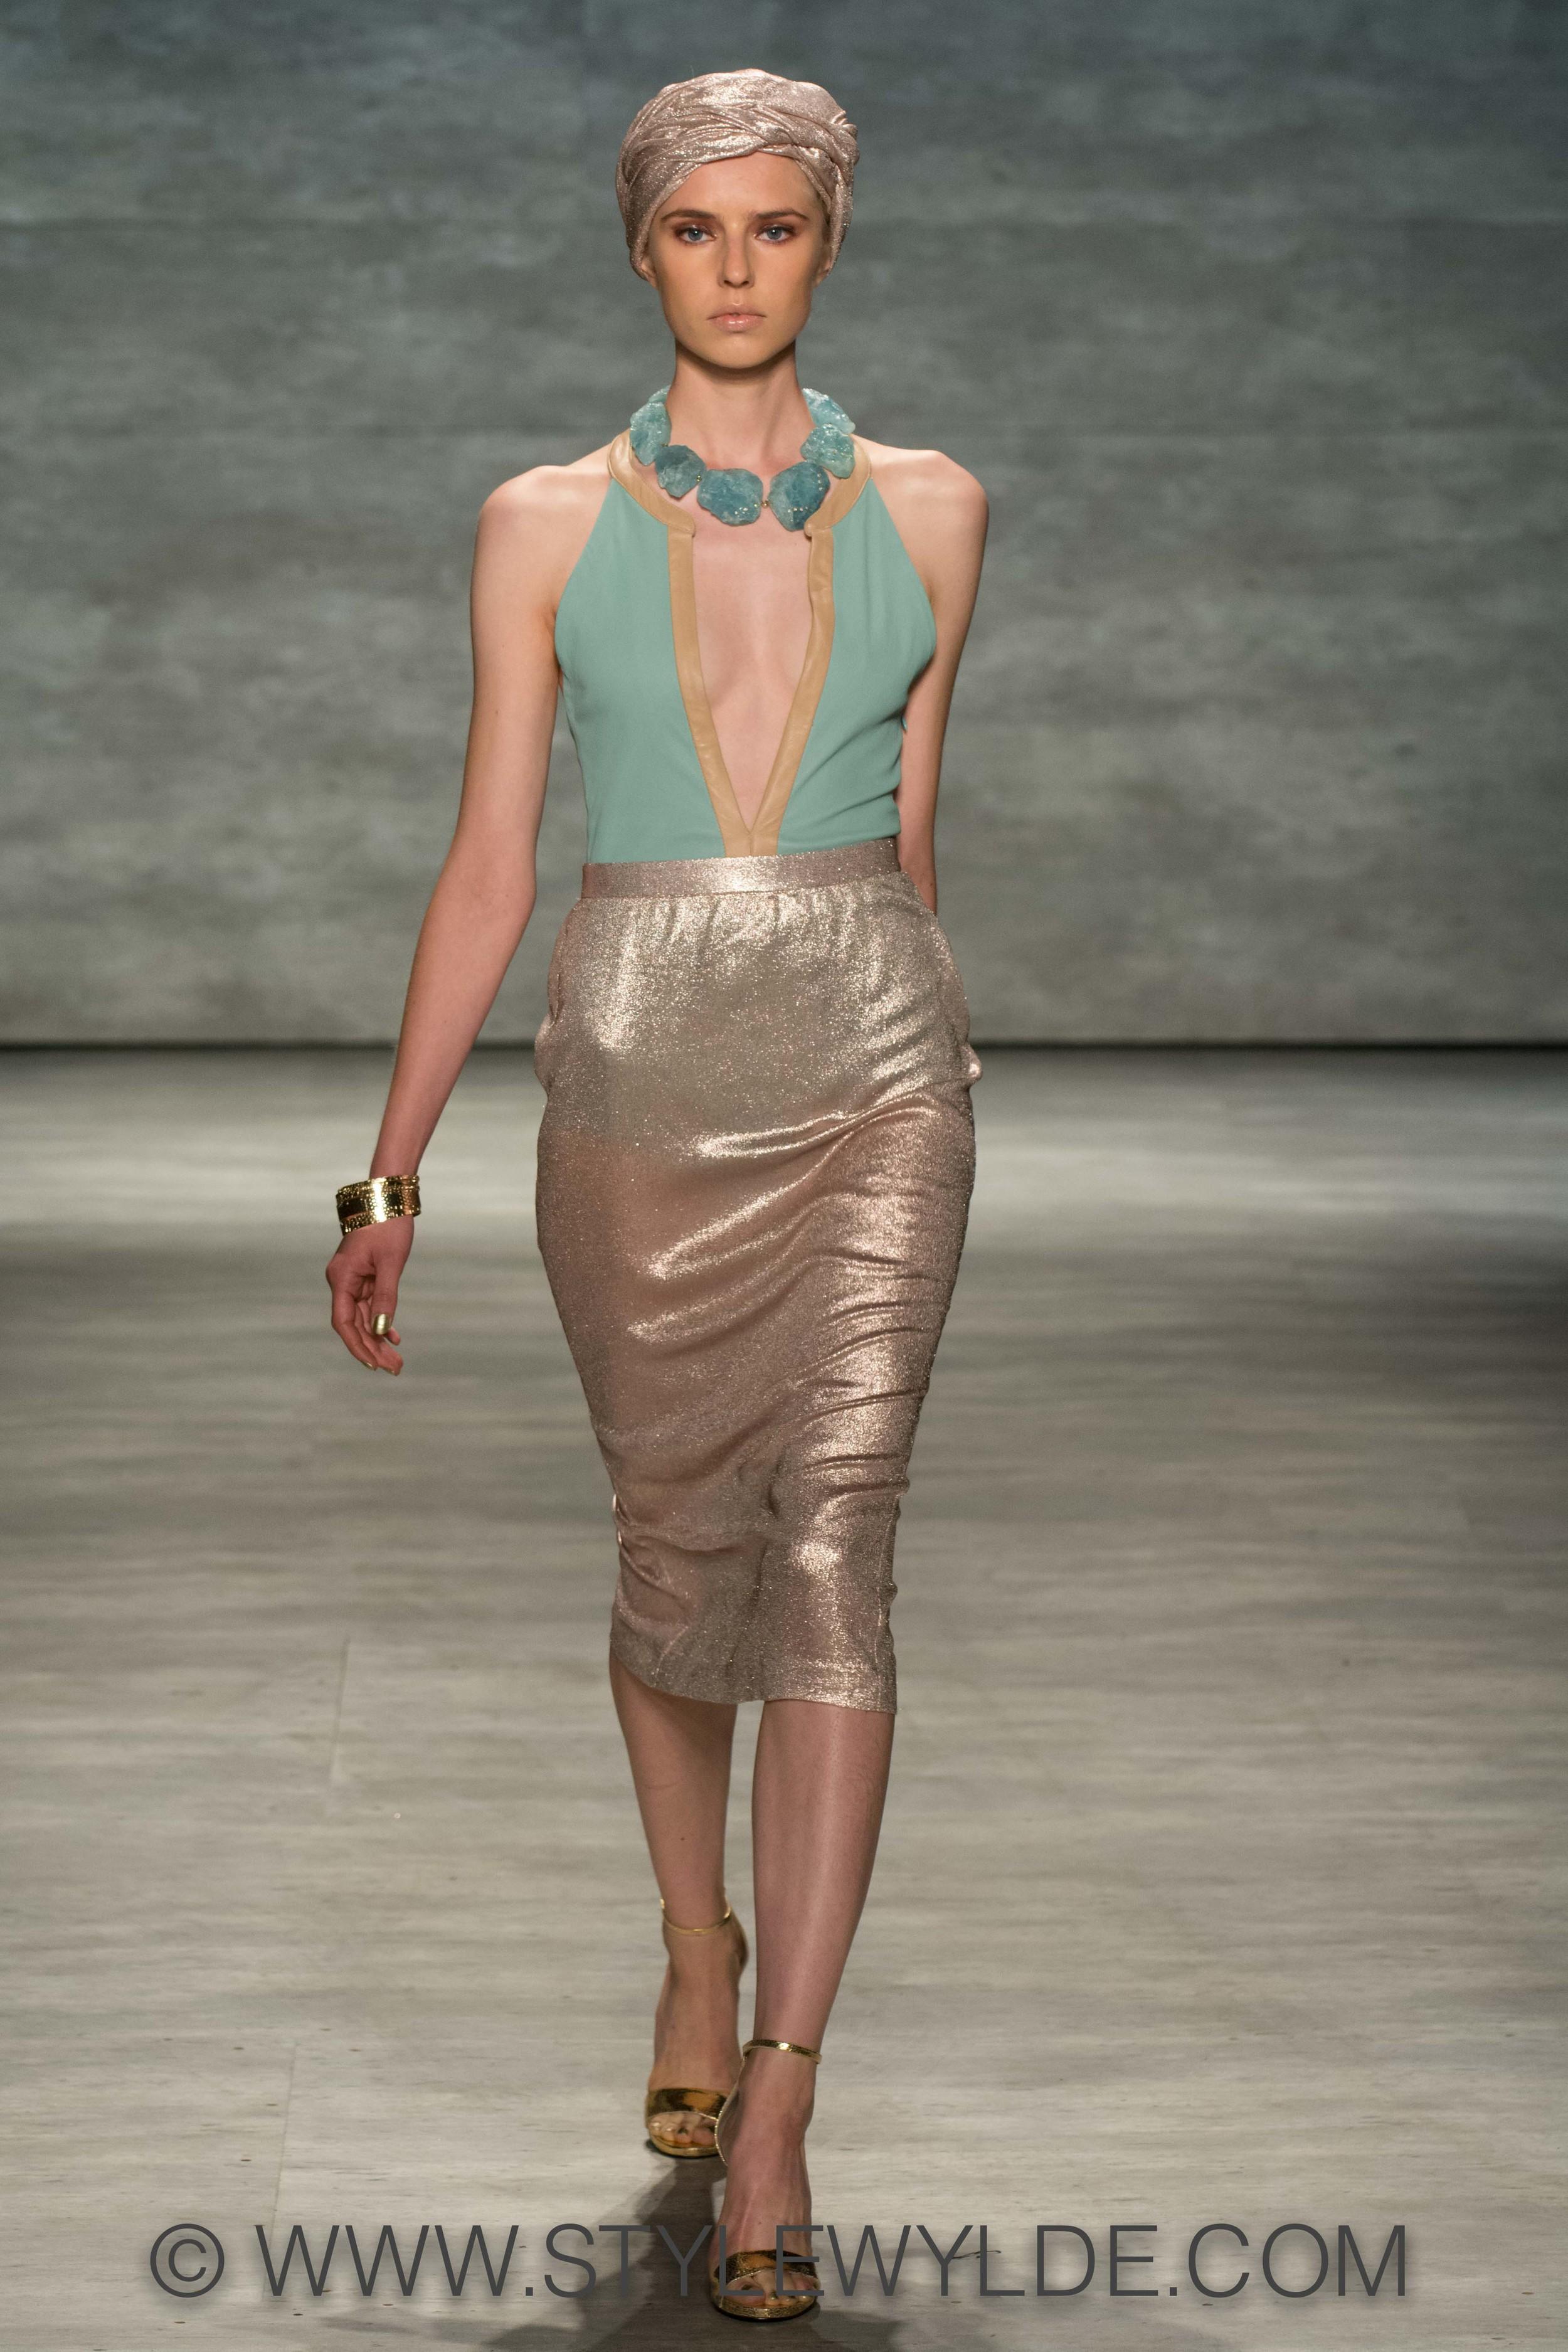 StyleWylde_Georgine_SS15_FOH (4 of 35).jpg